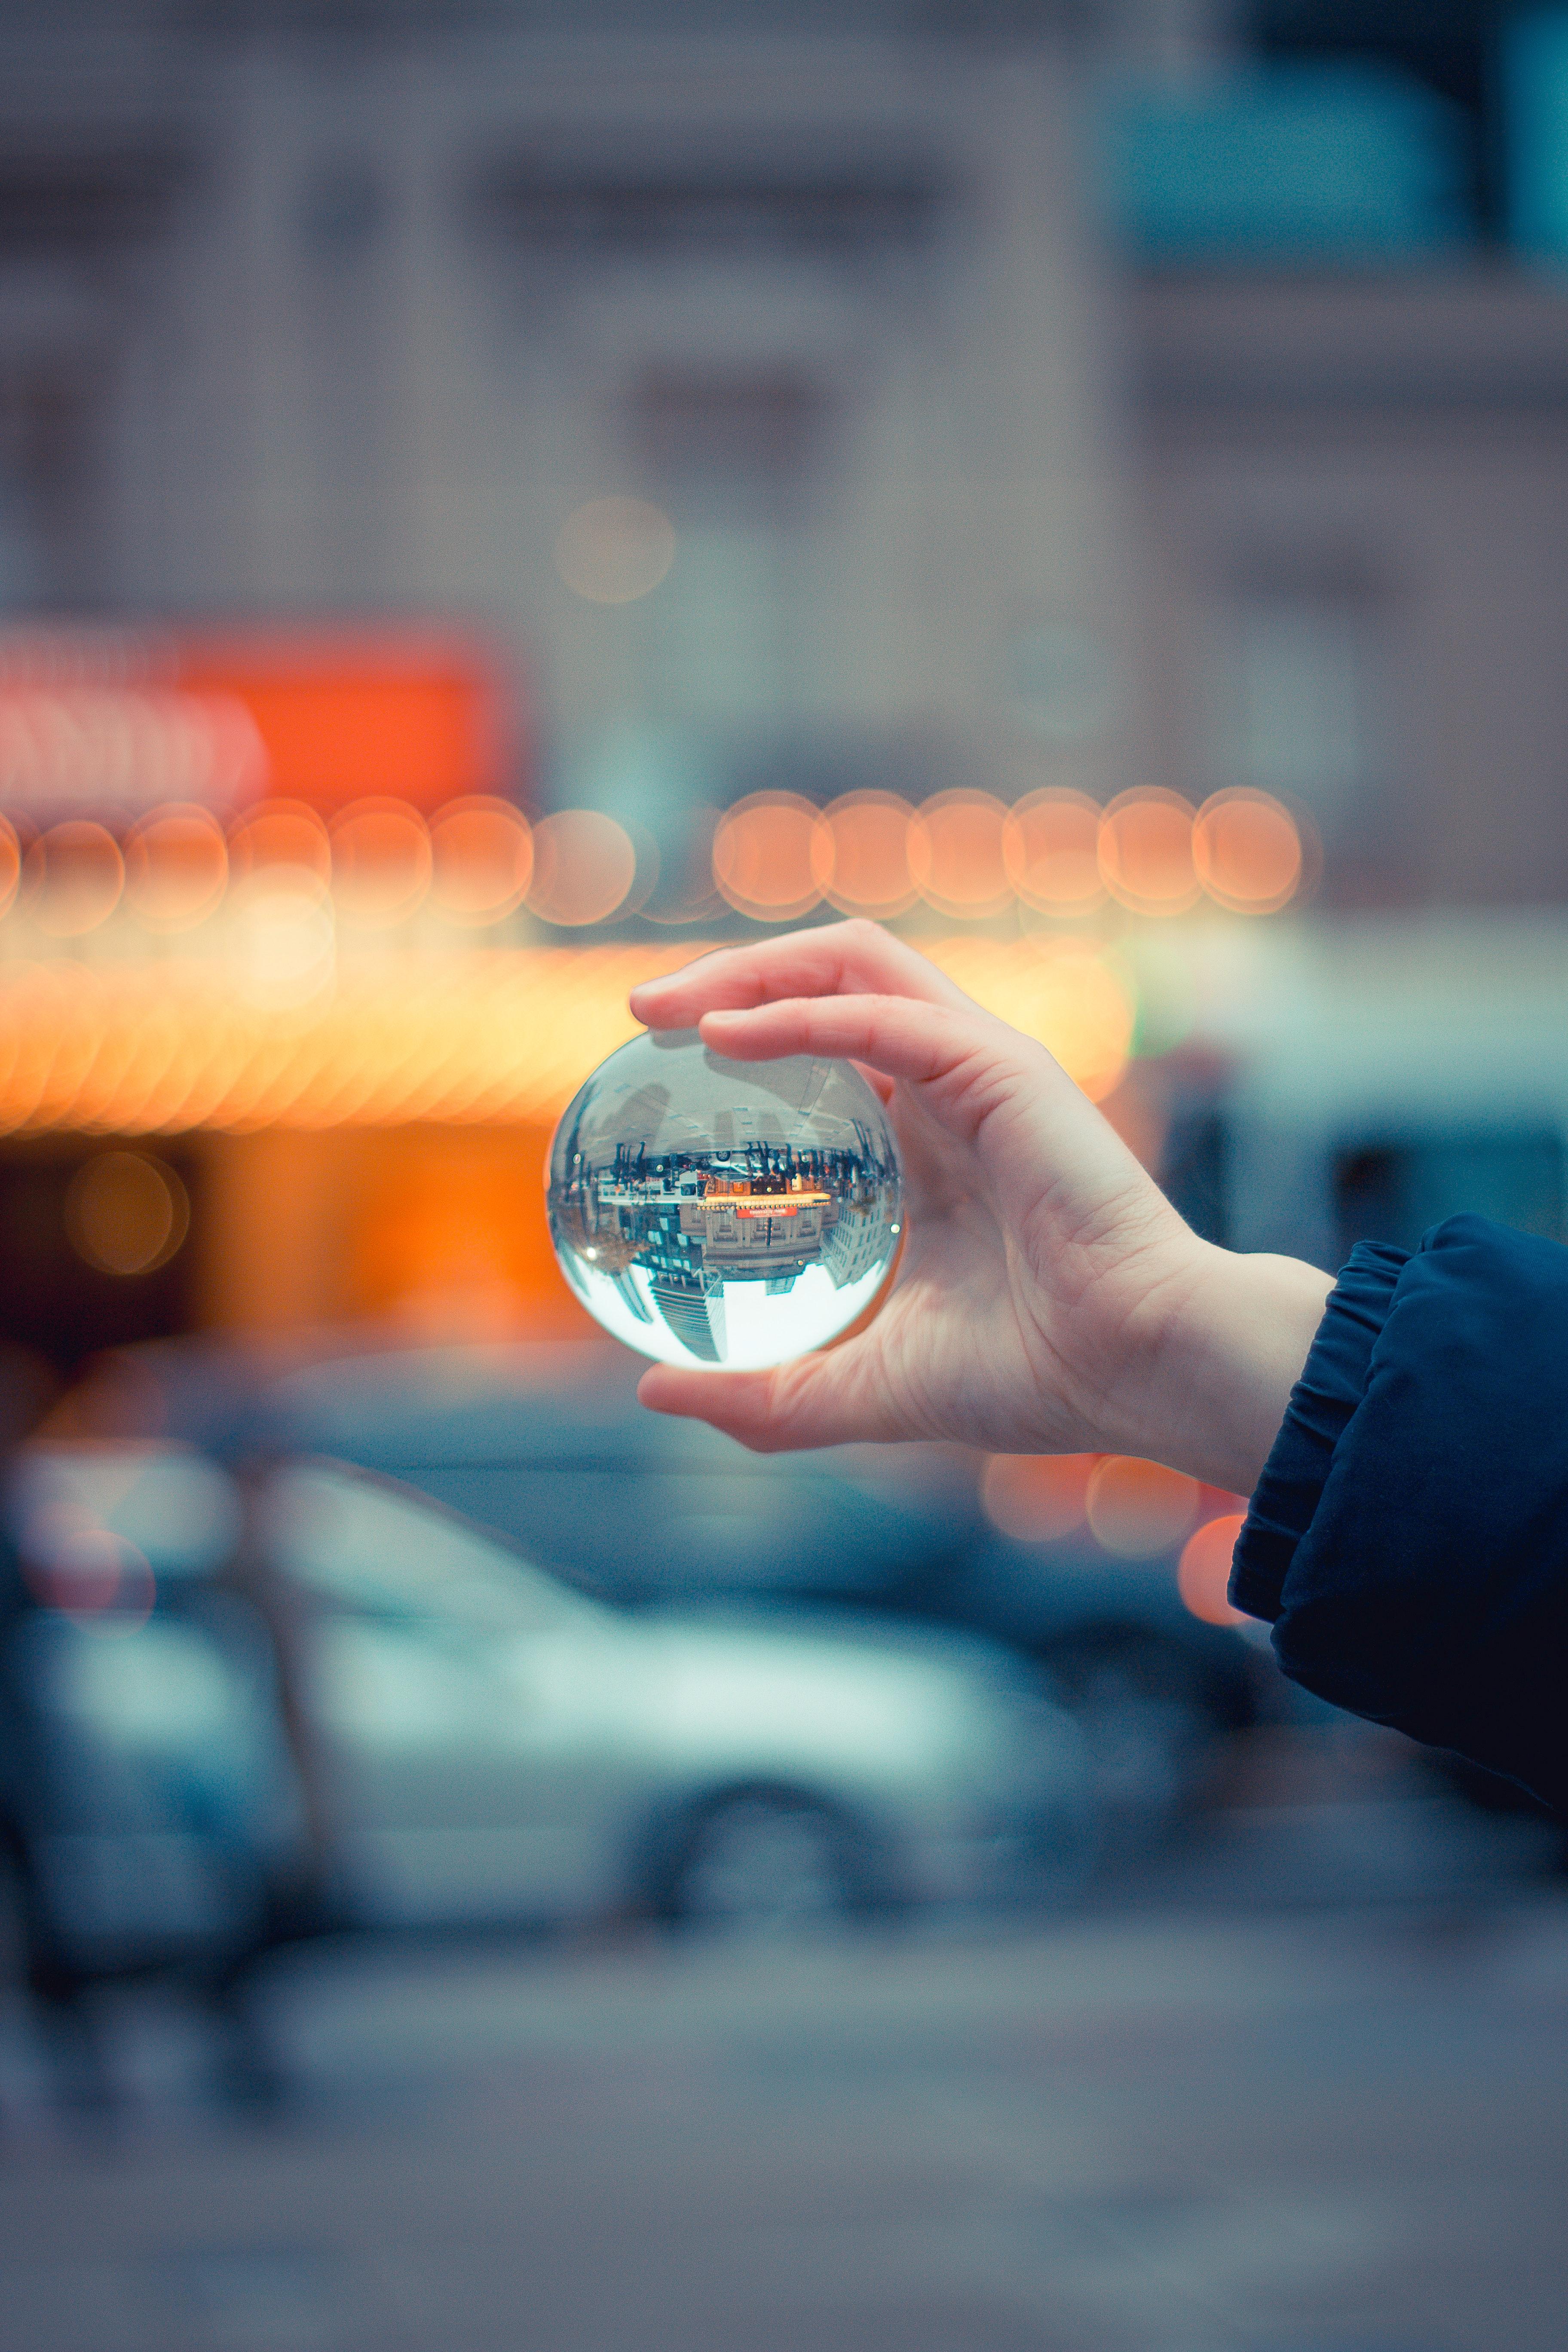 Person holding round glass ball macro shot photo